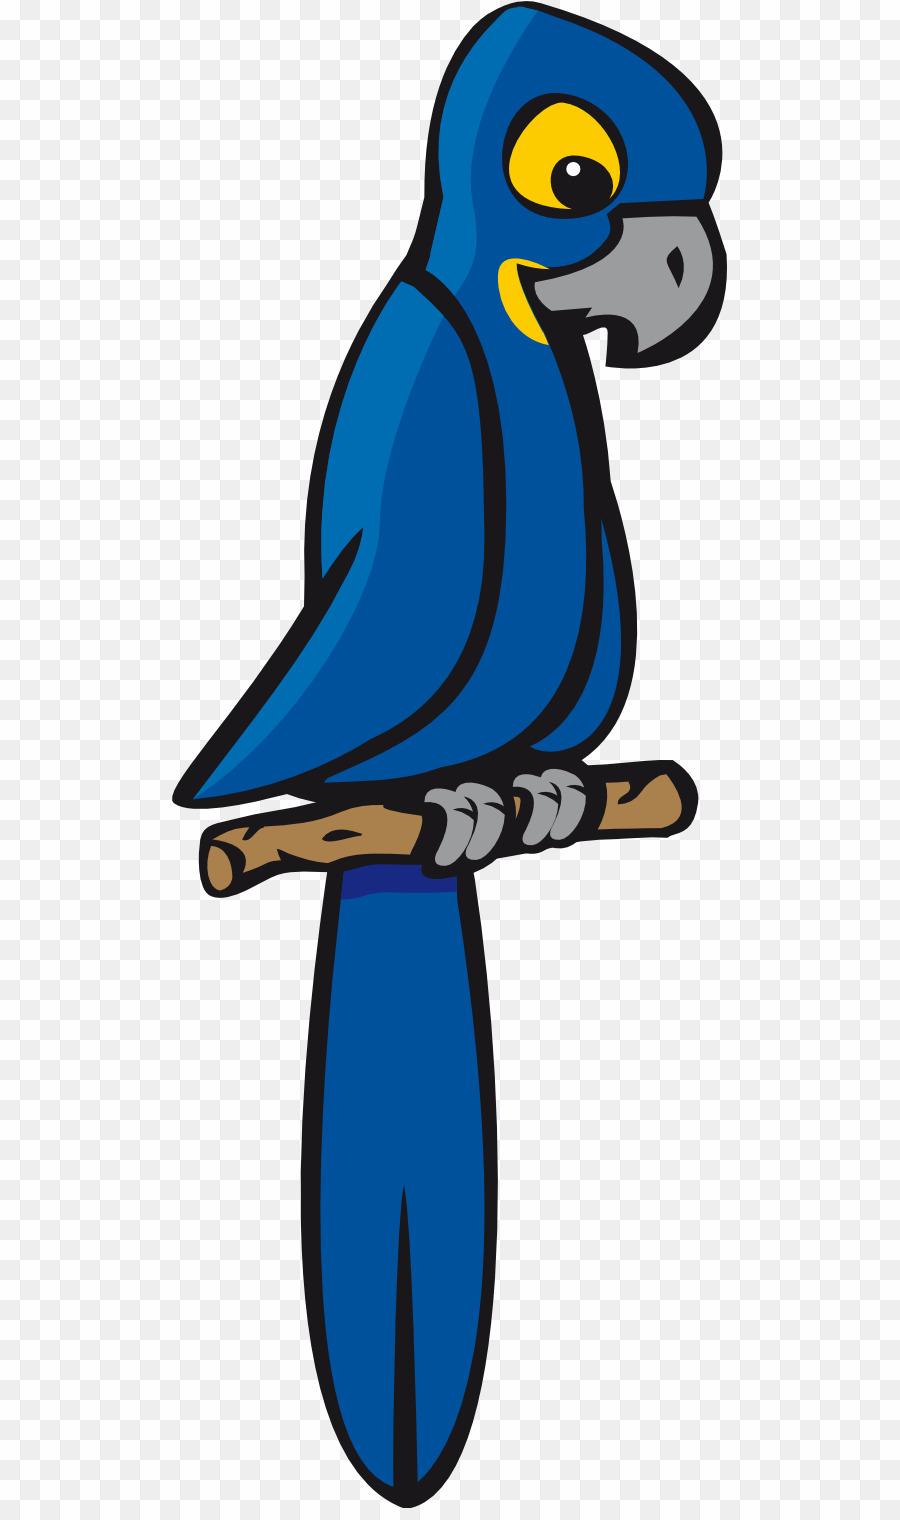 Parrot clipart hyacinth macaw. Cartoon png bird download